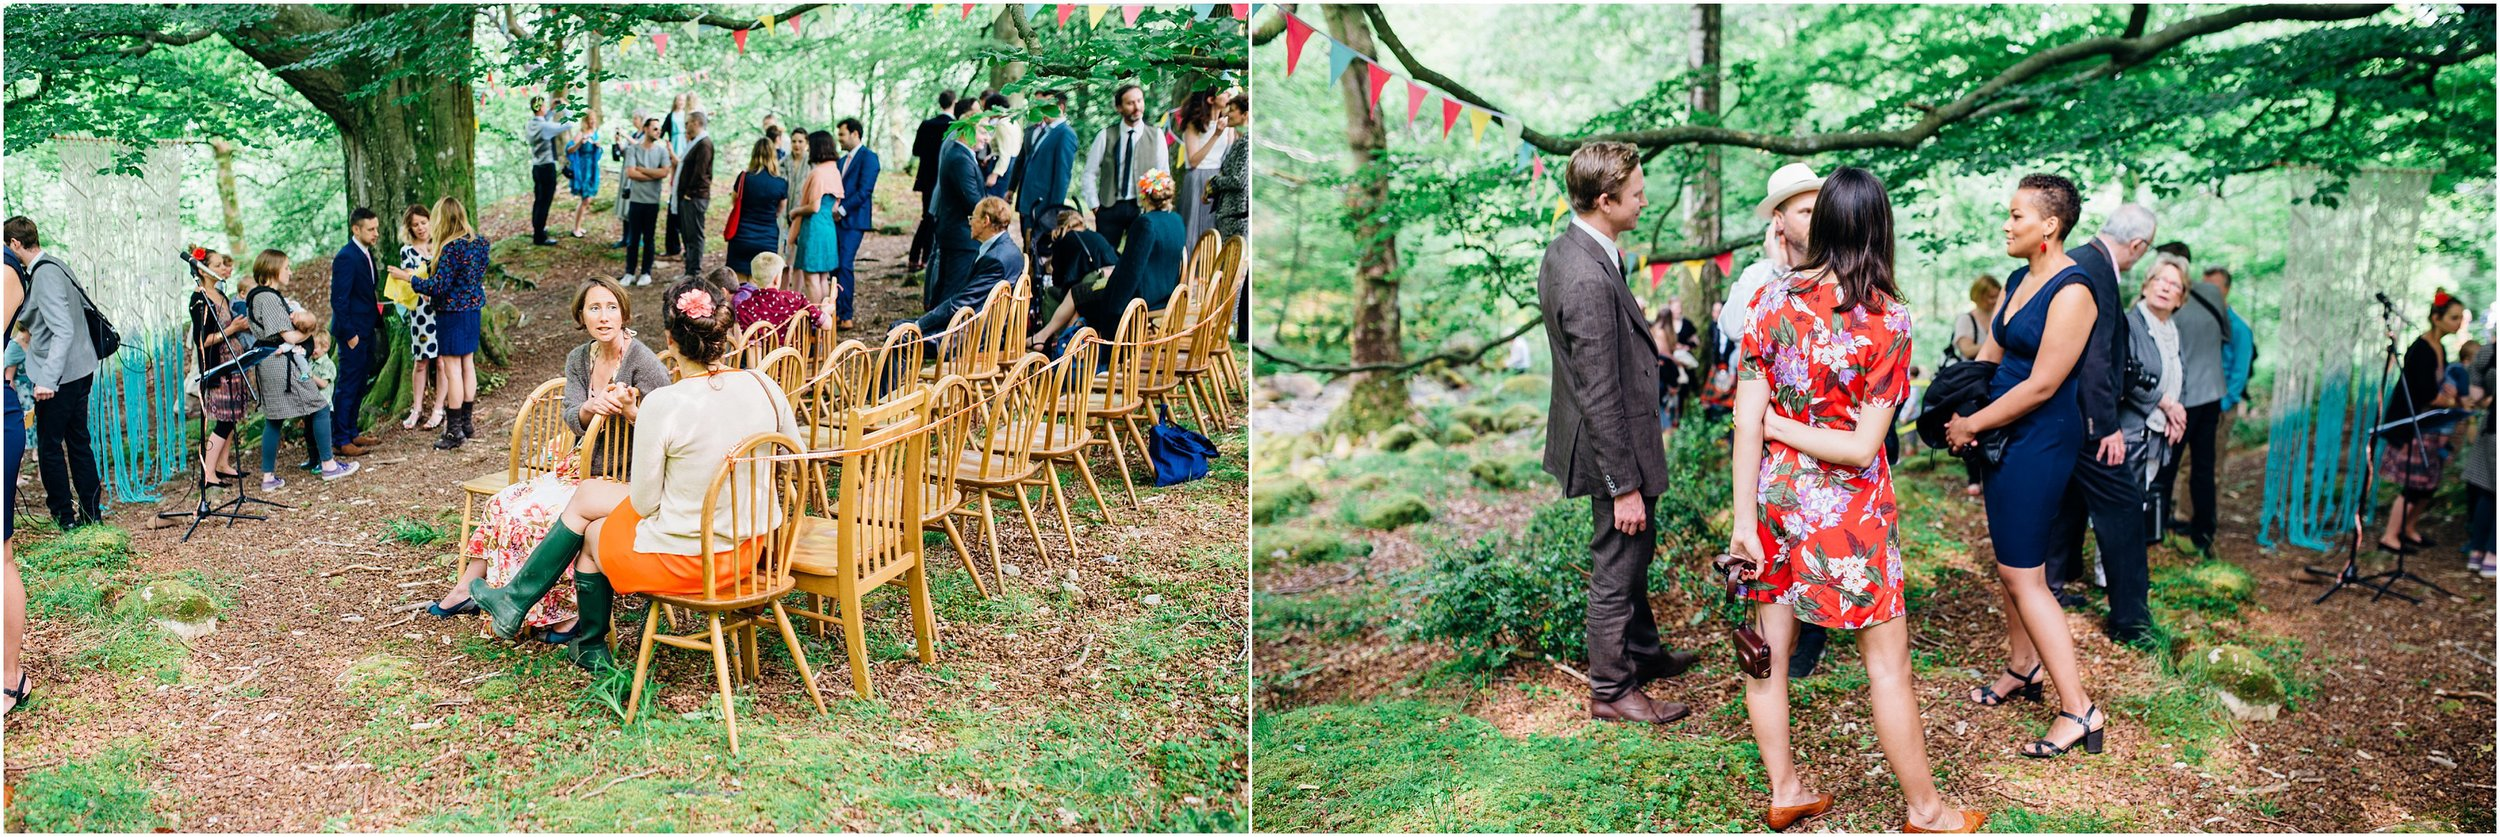 lake district wedding photographer_0022.jpg